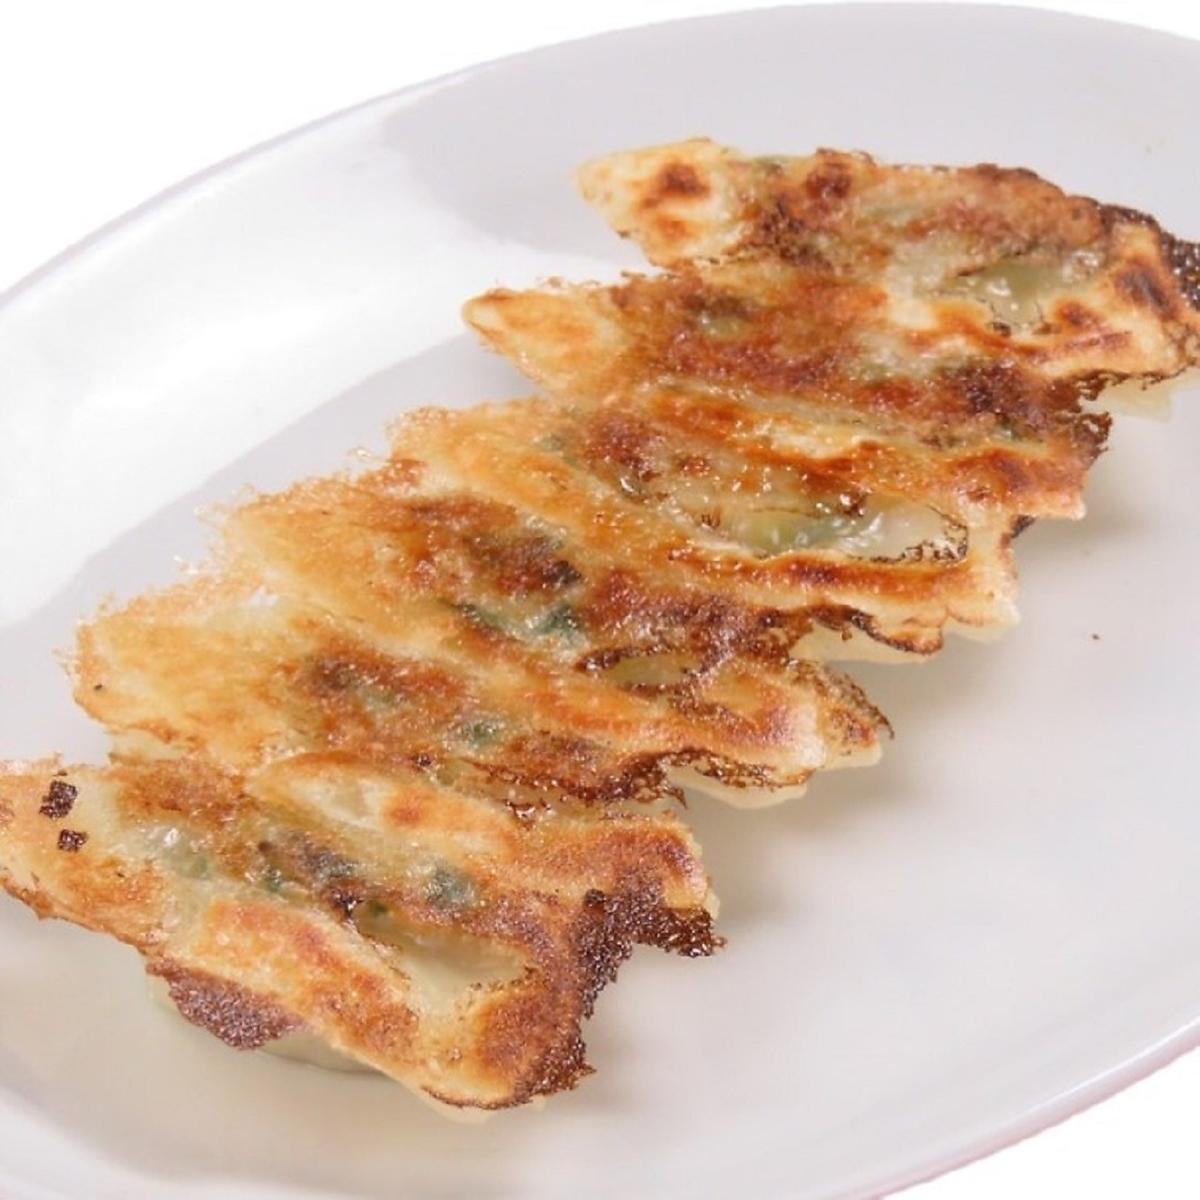 Crispy fried dumplings (6 pieces)